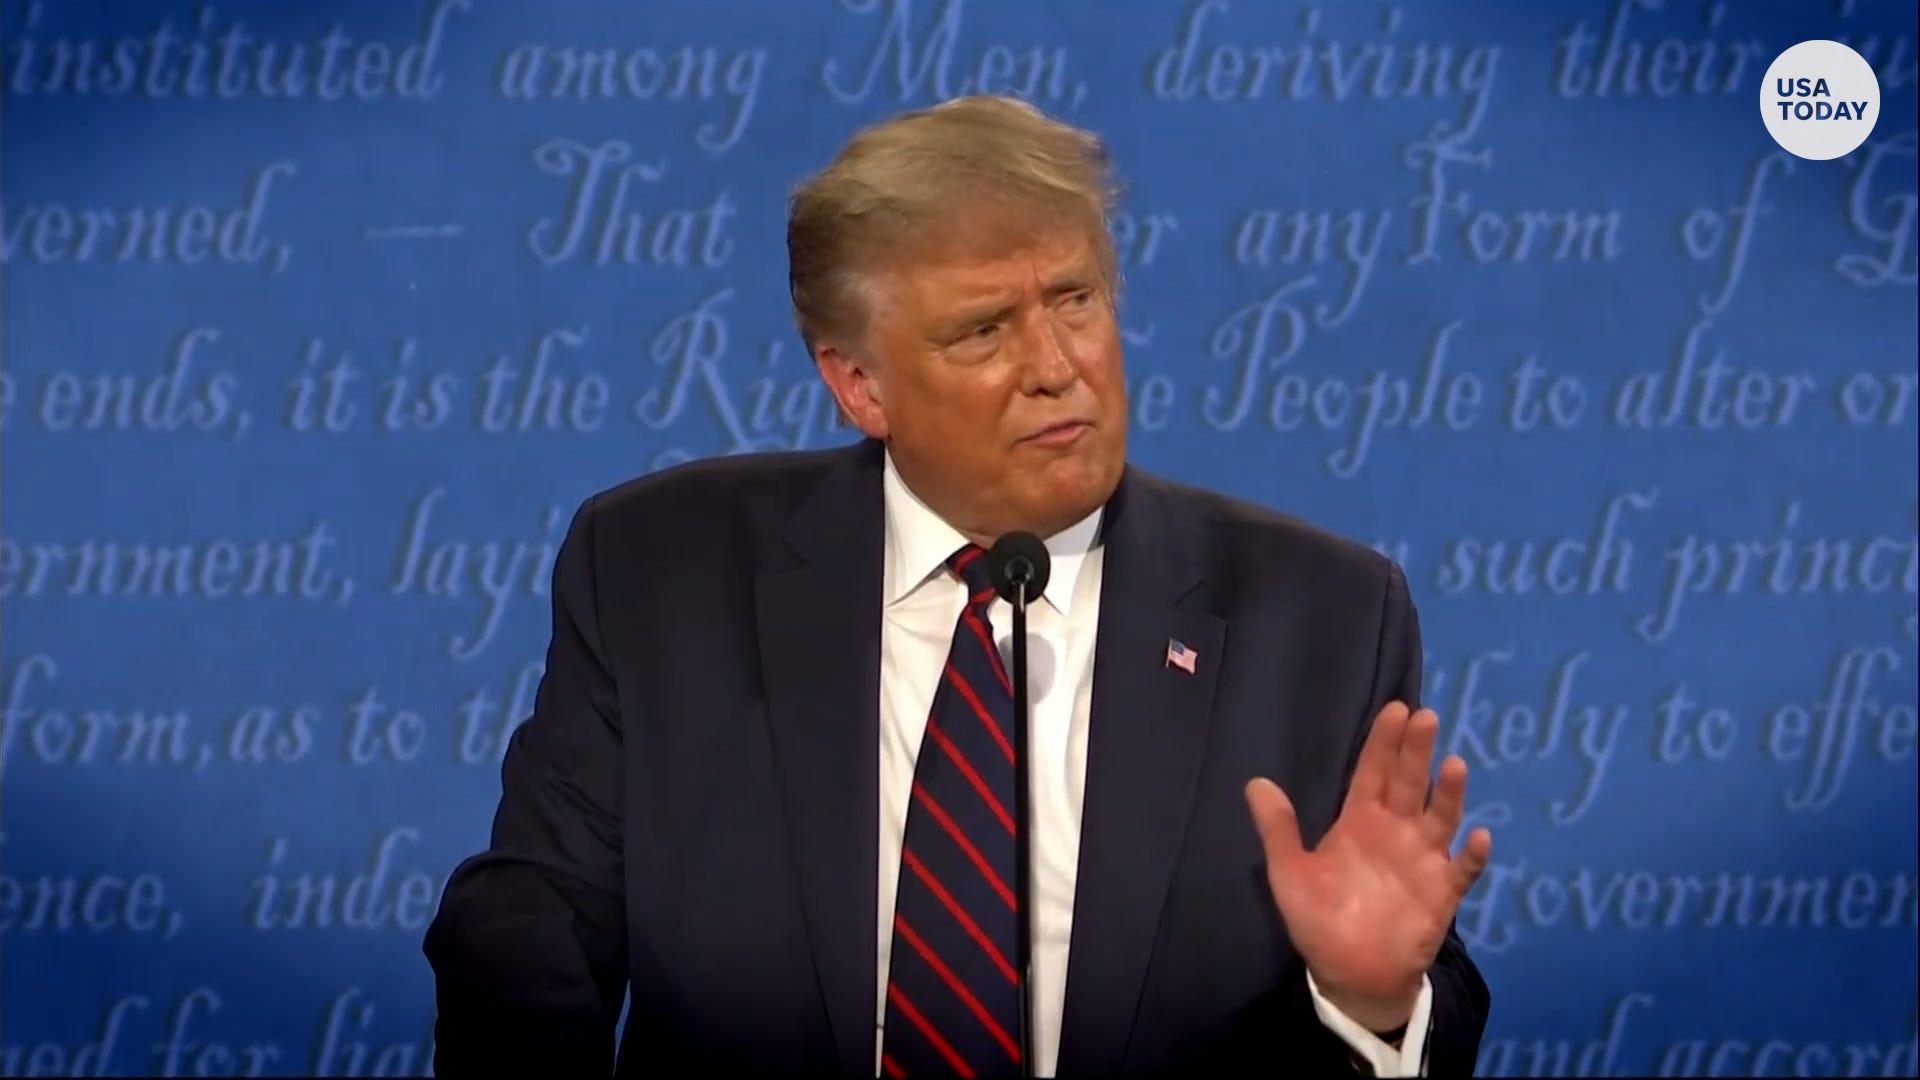 President Trump slams Hunter Biden at first presidential debate